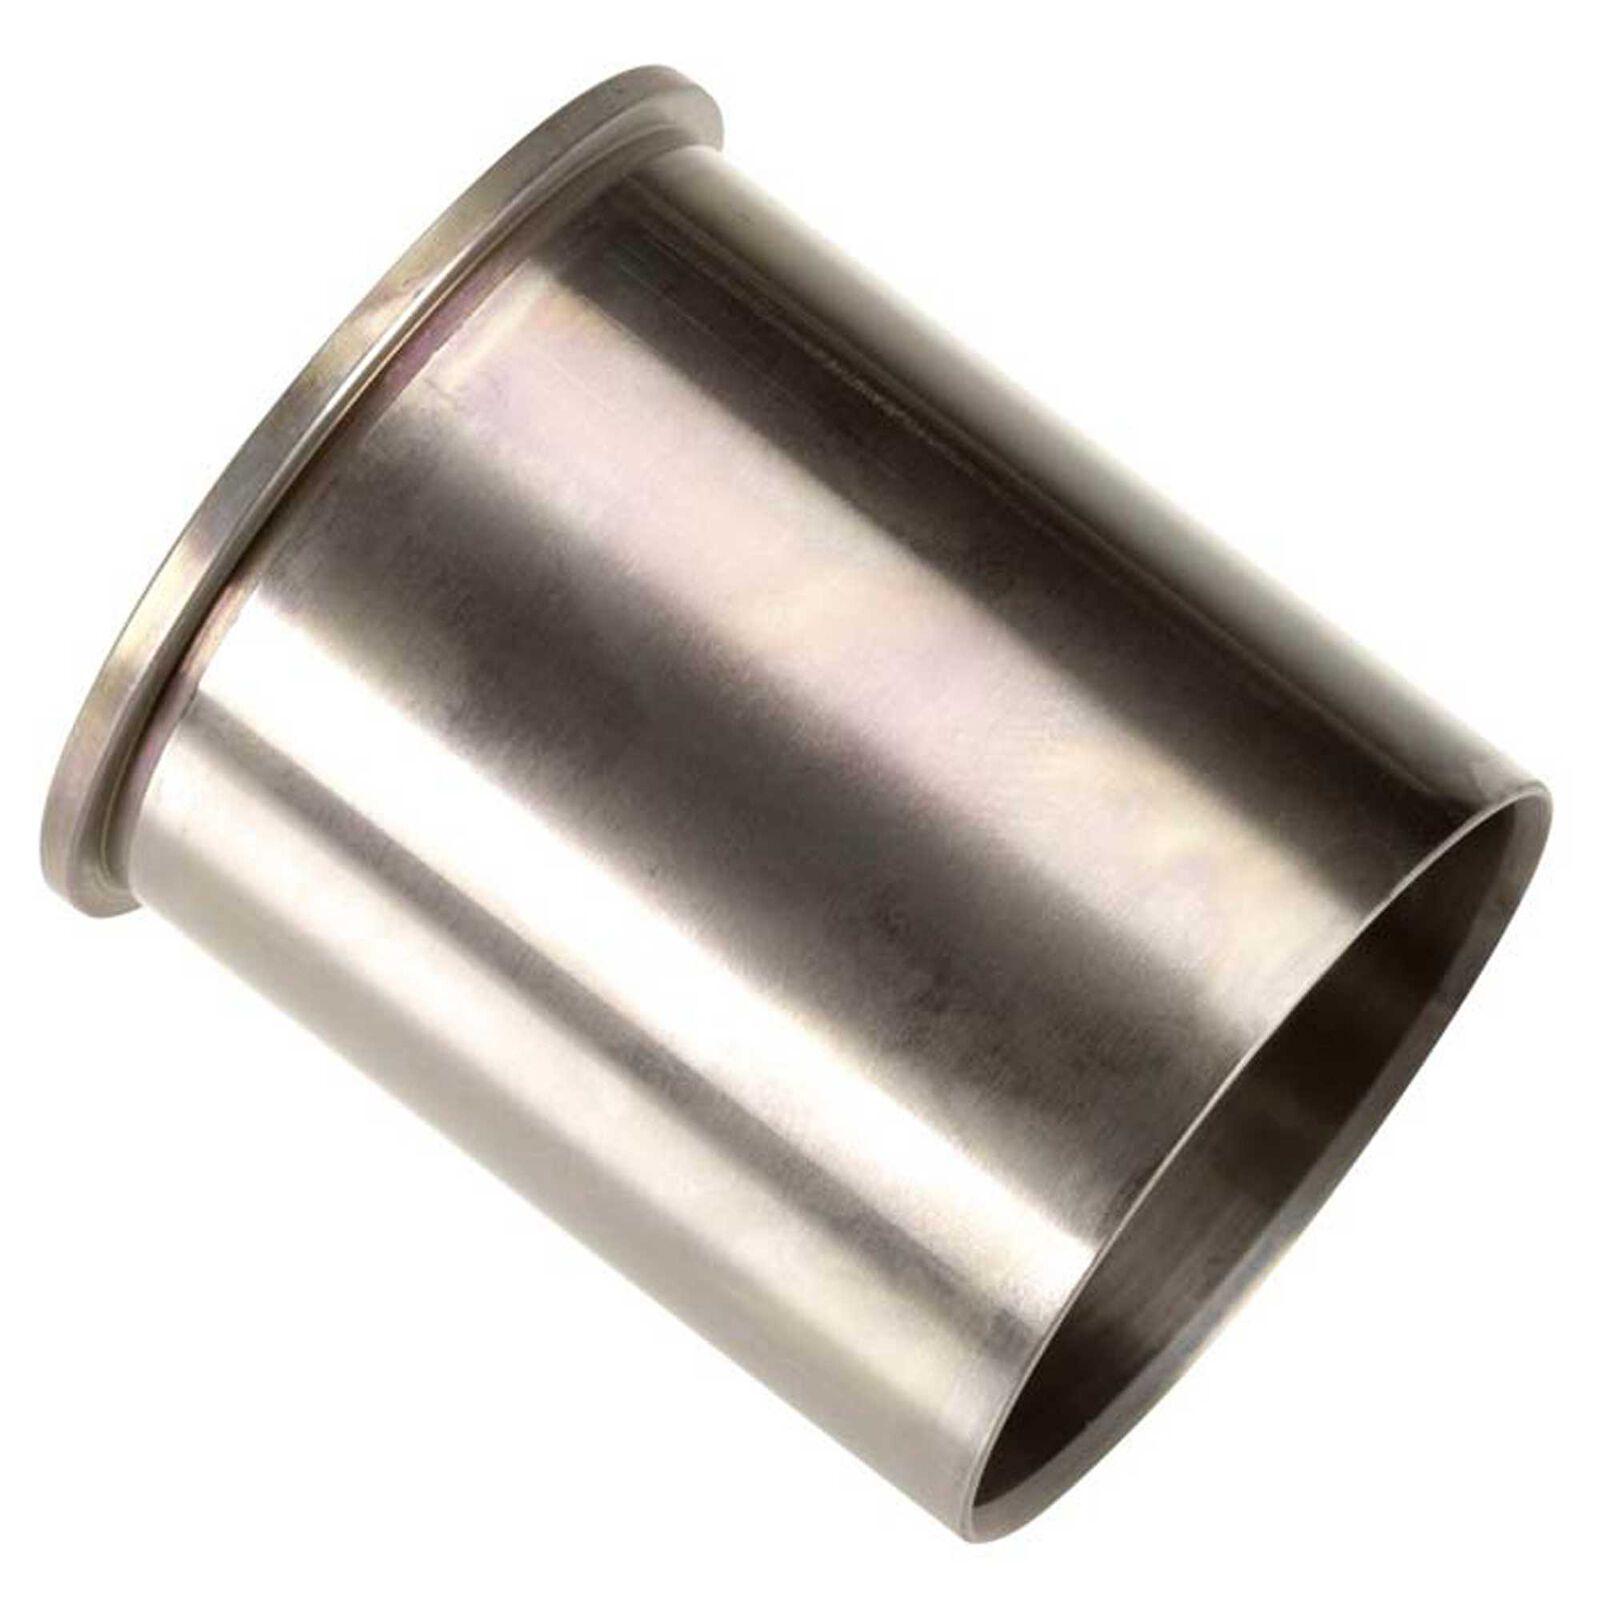 Cylinder Liner: 200 Surpass